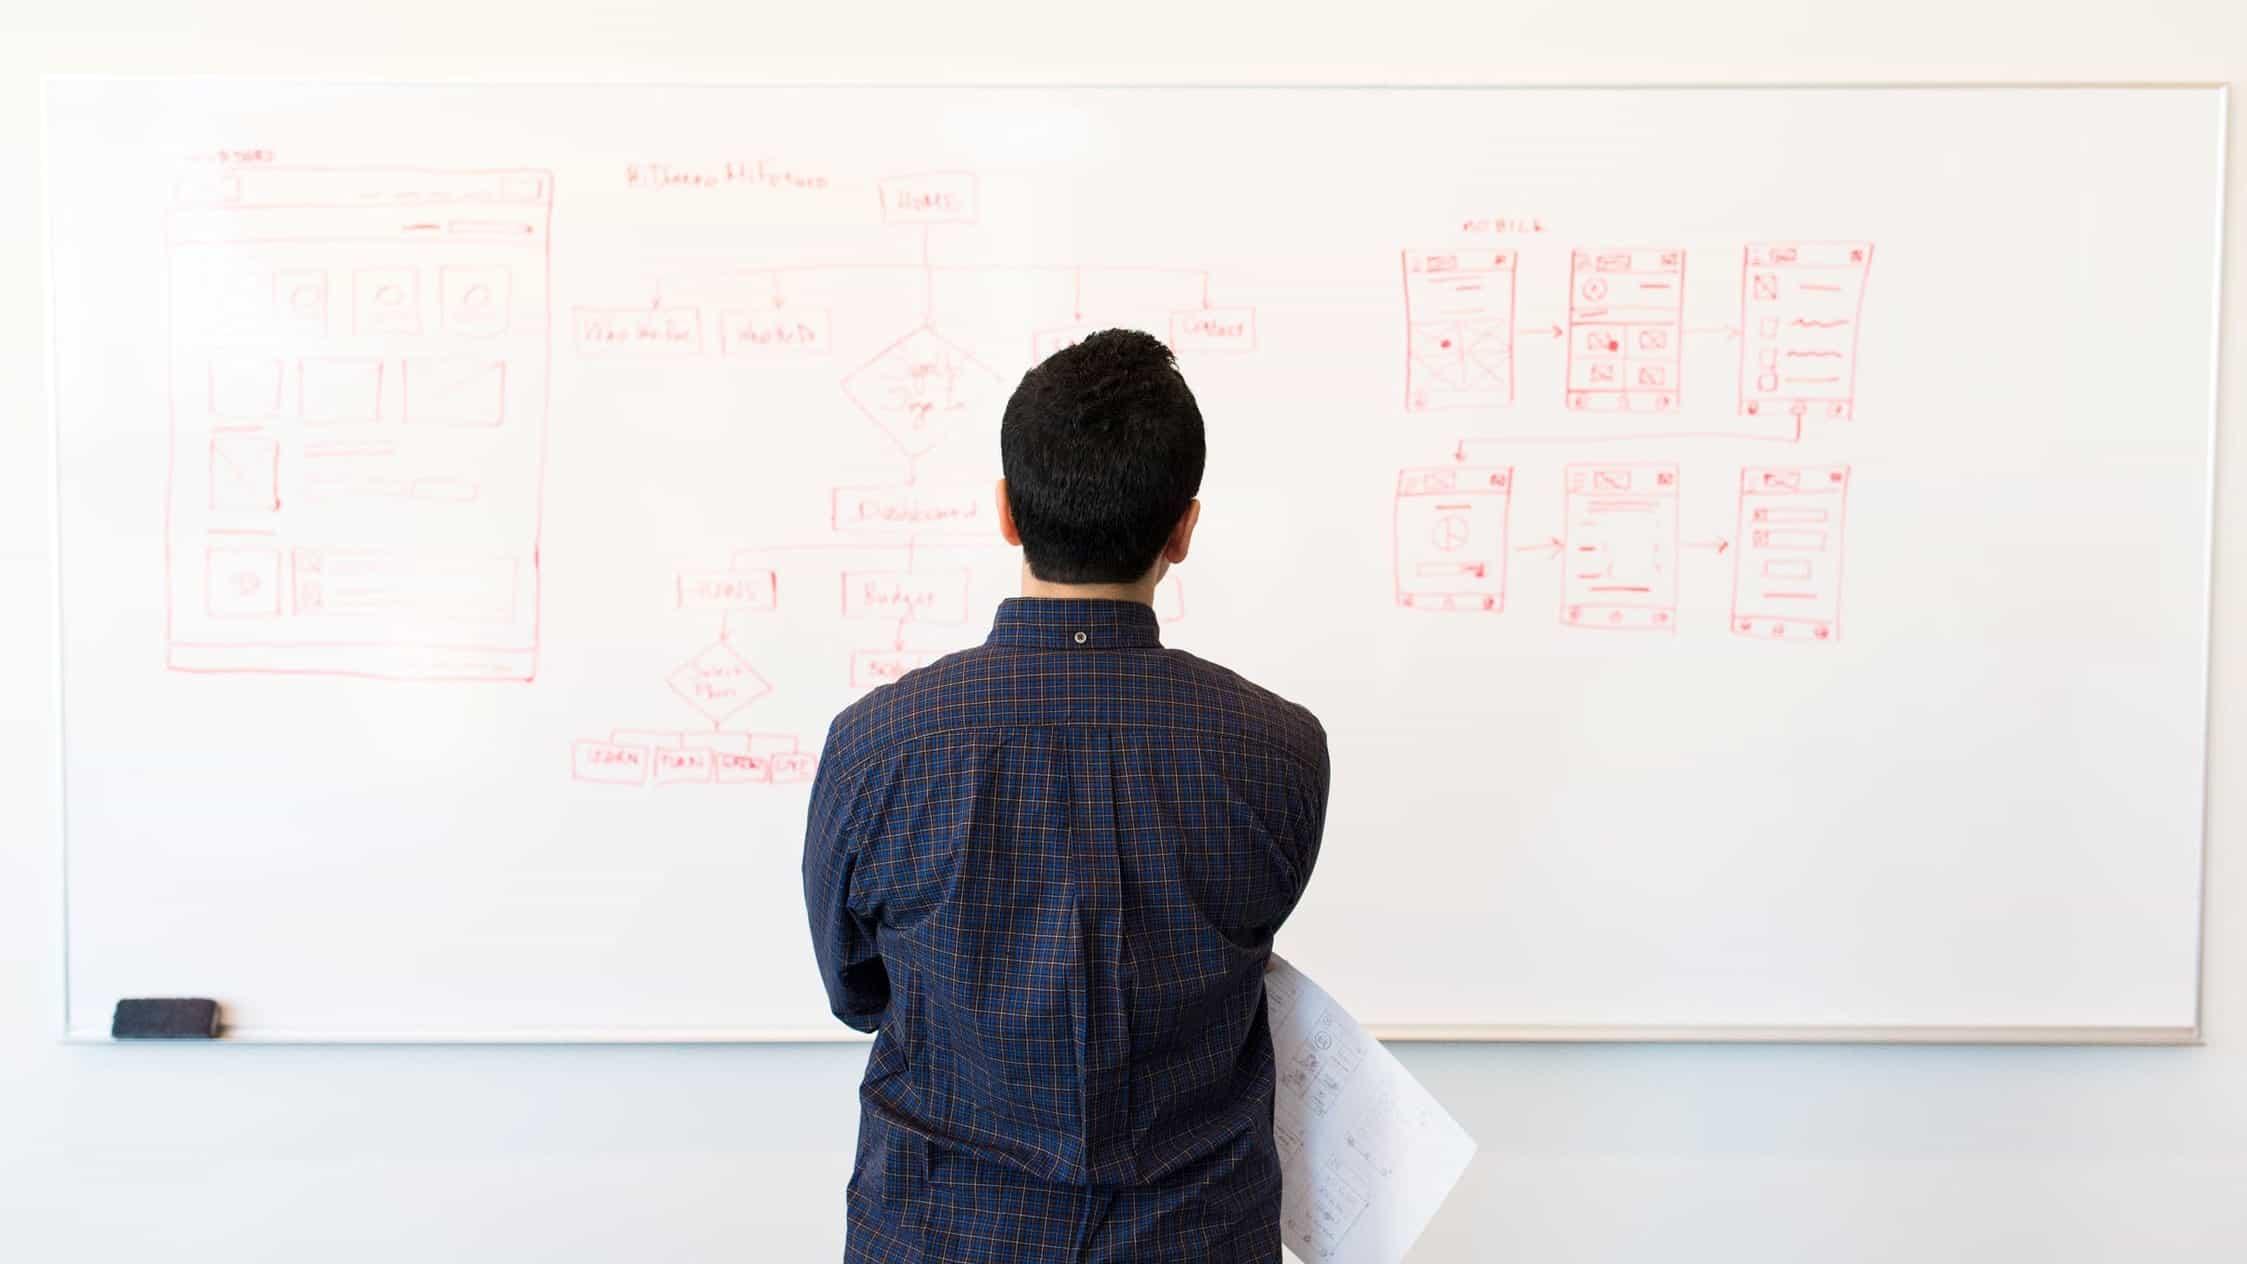 Man looking at whiteboard